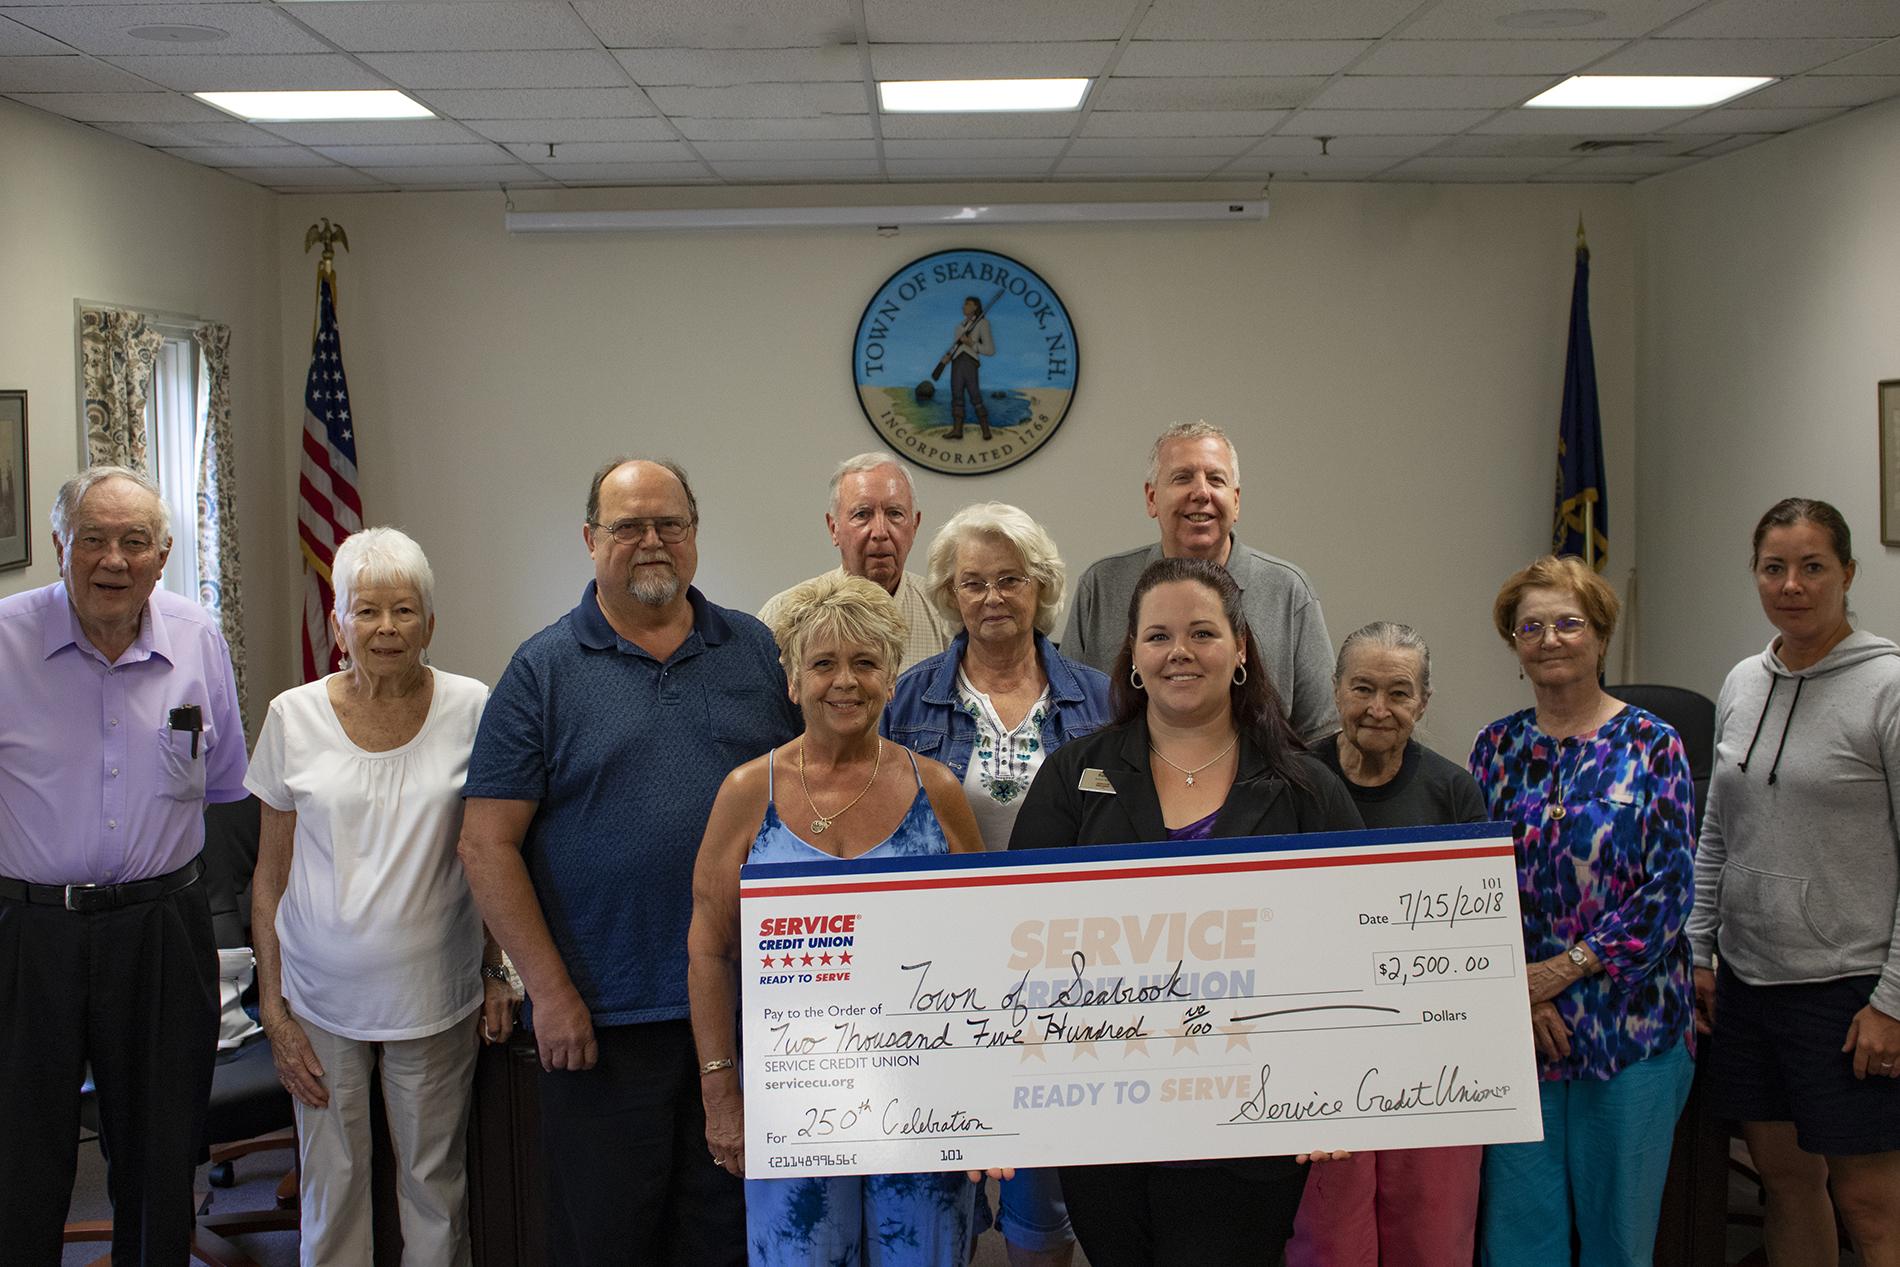 Service Credit Union Supports Seabrook 250th Anniversary Celebration